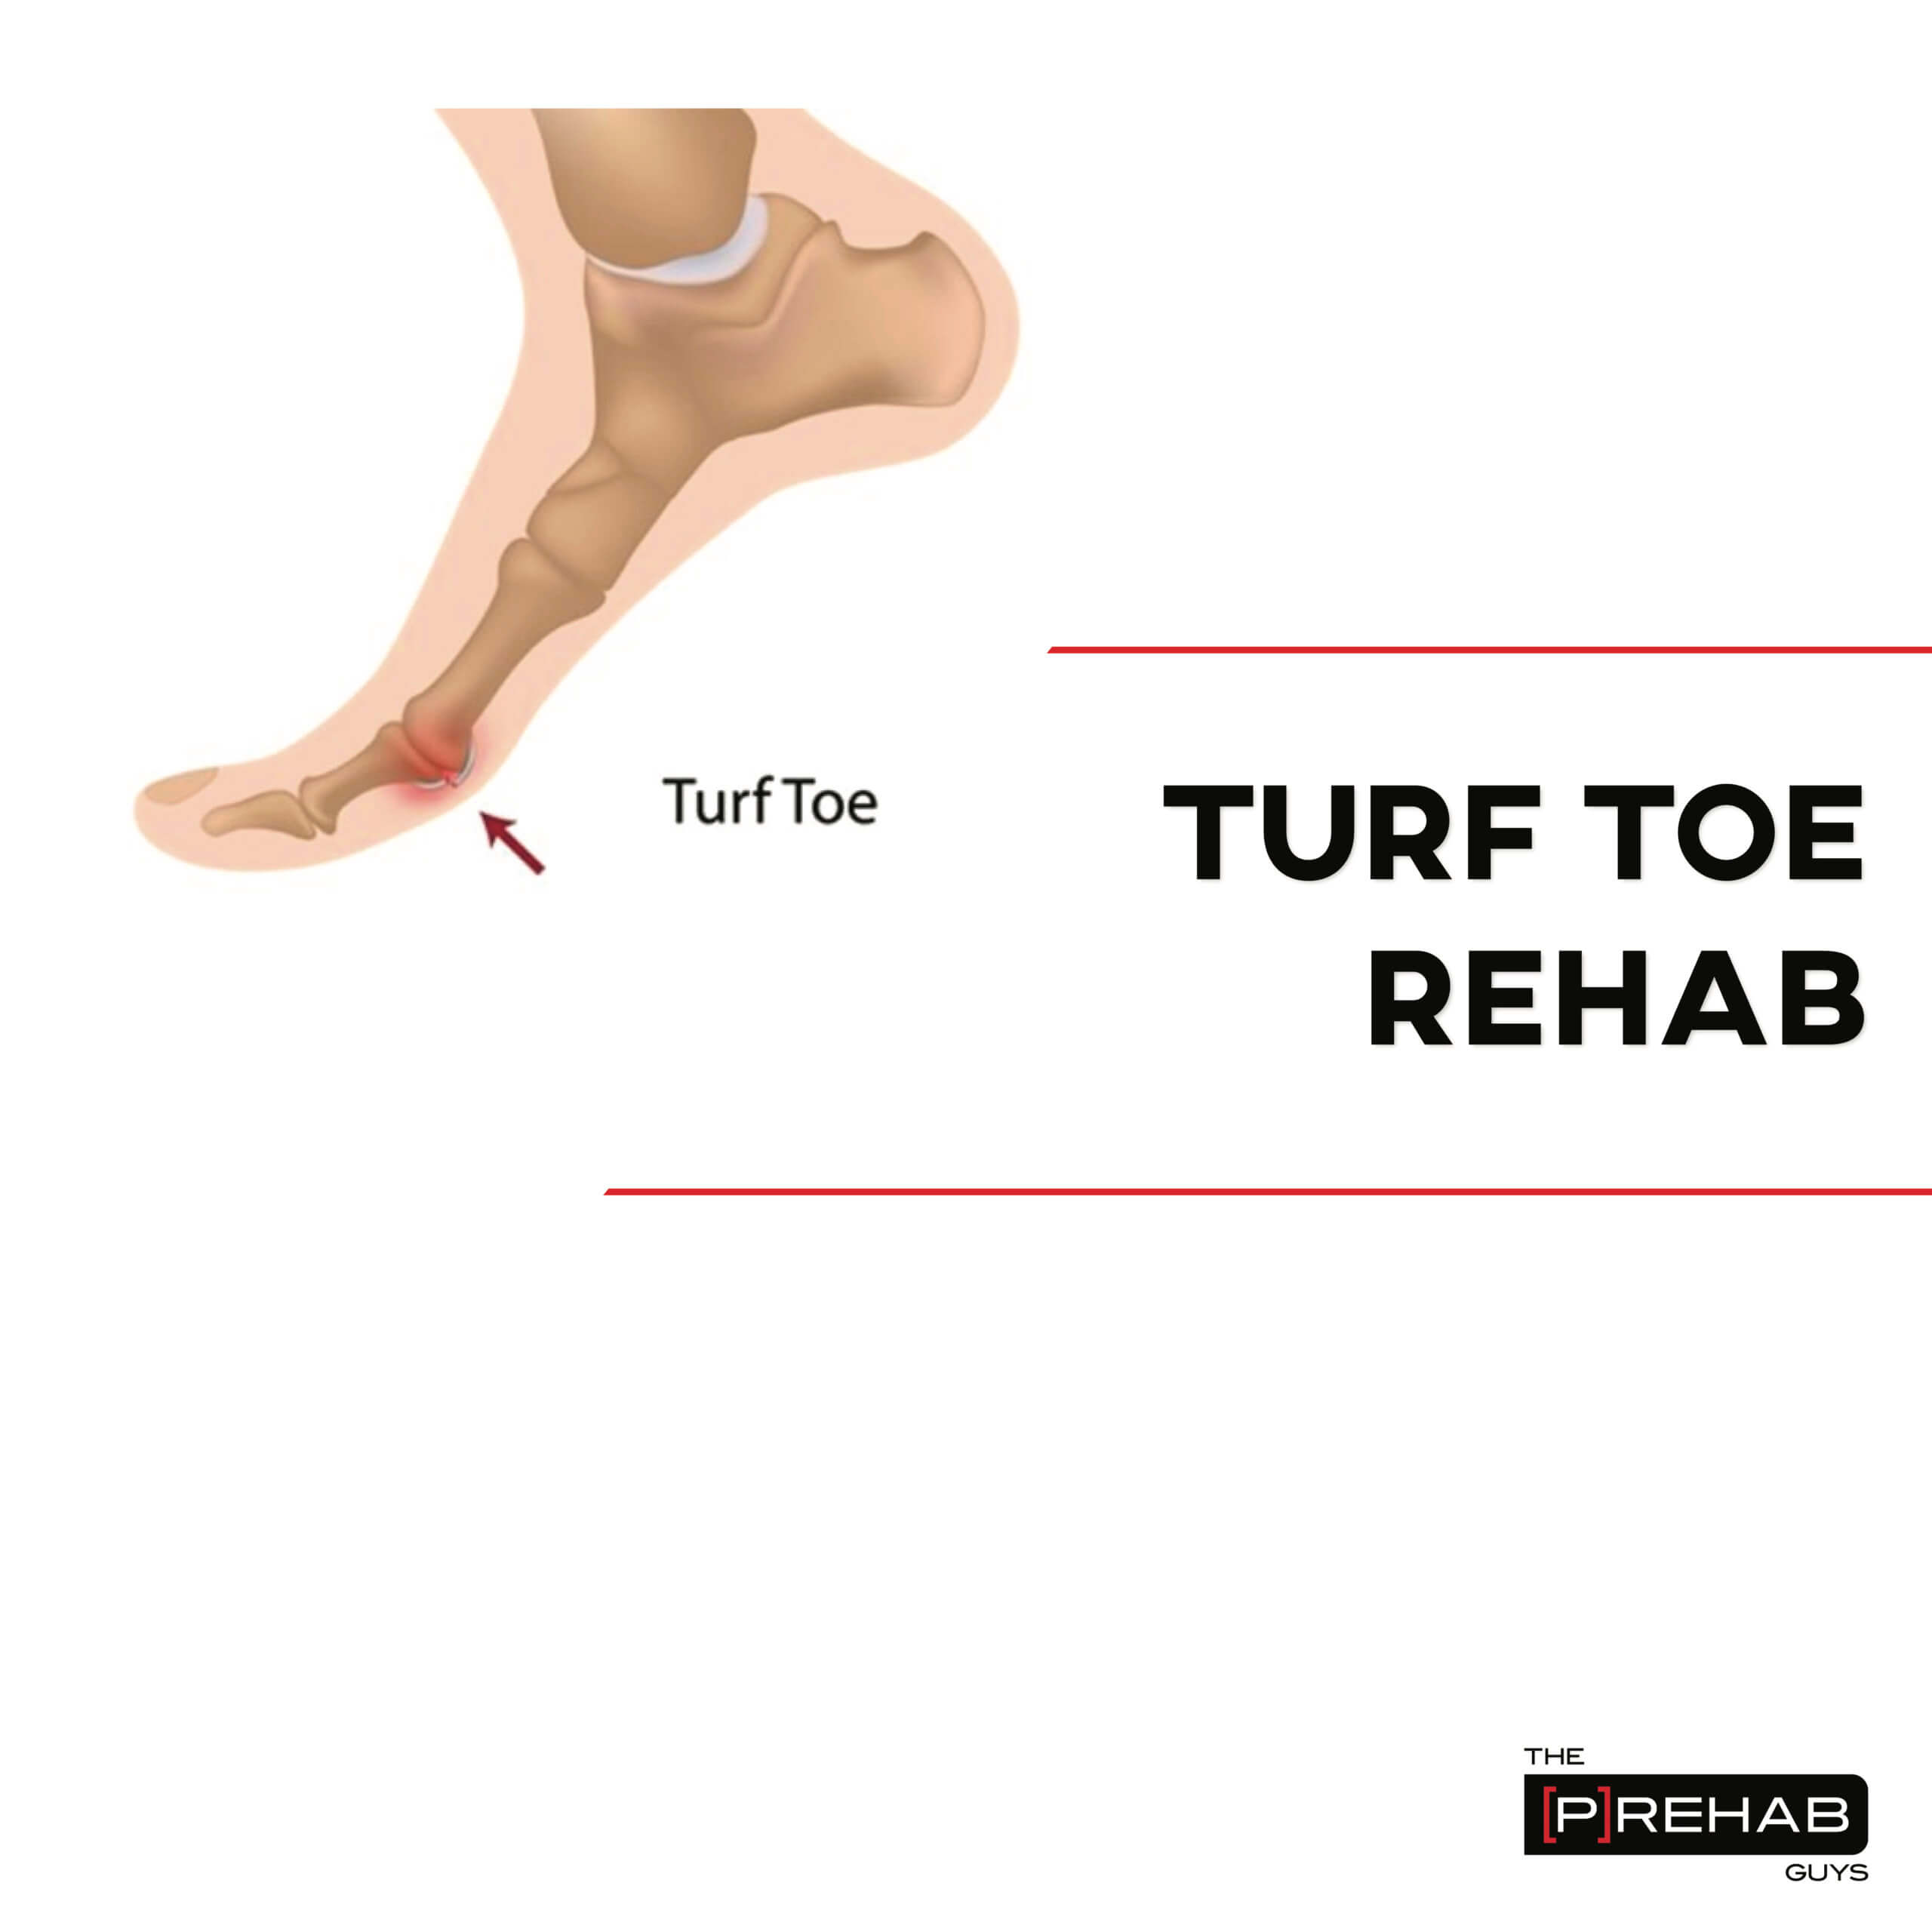 turf toe workout the prehab guys